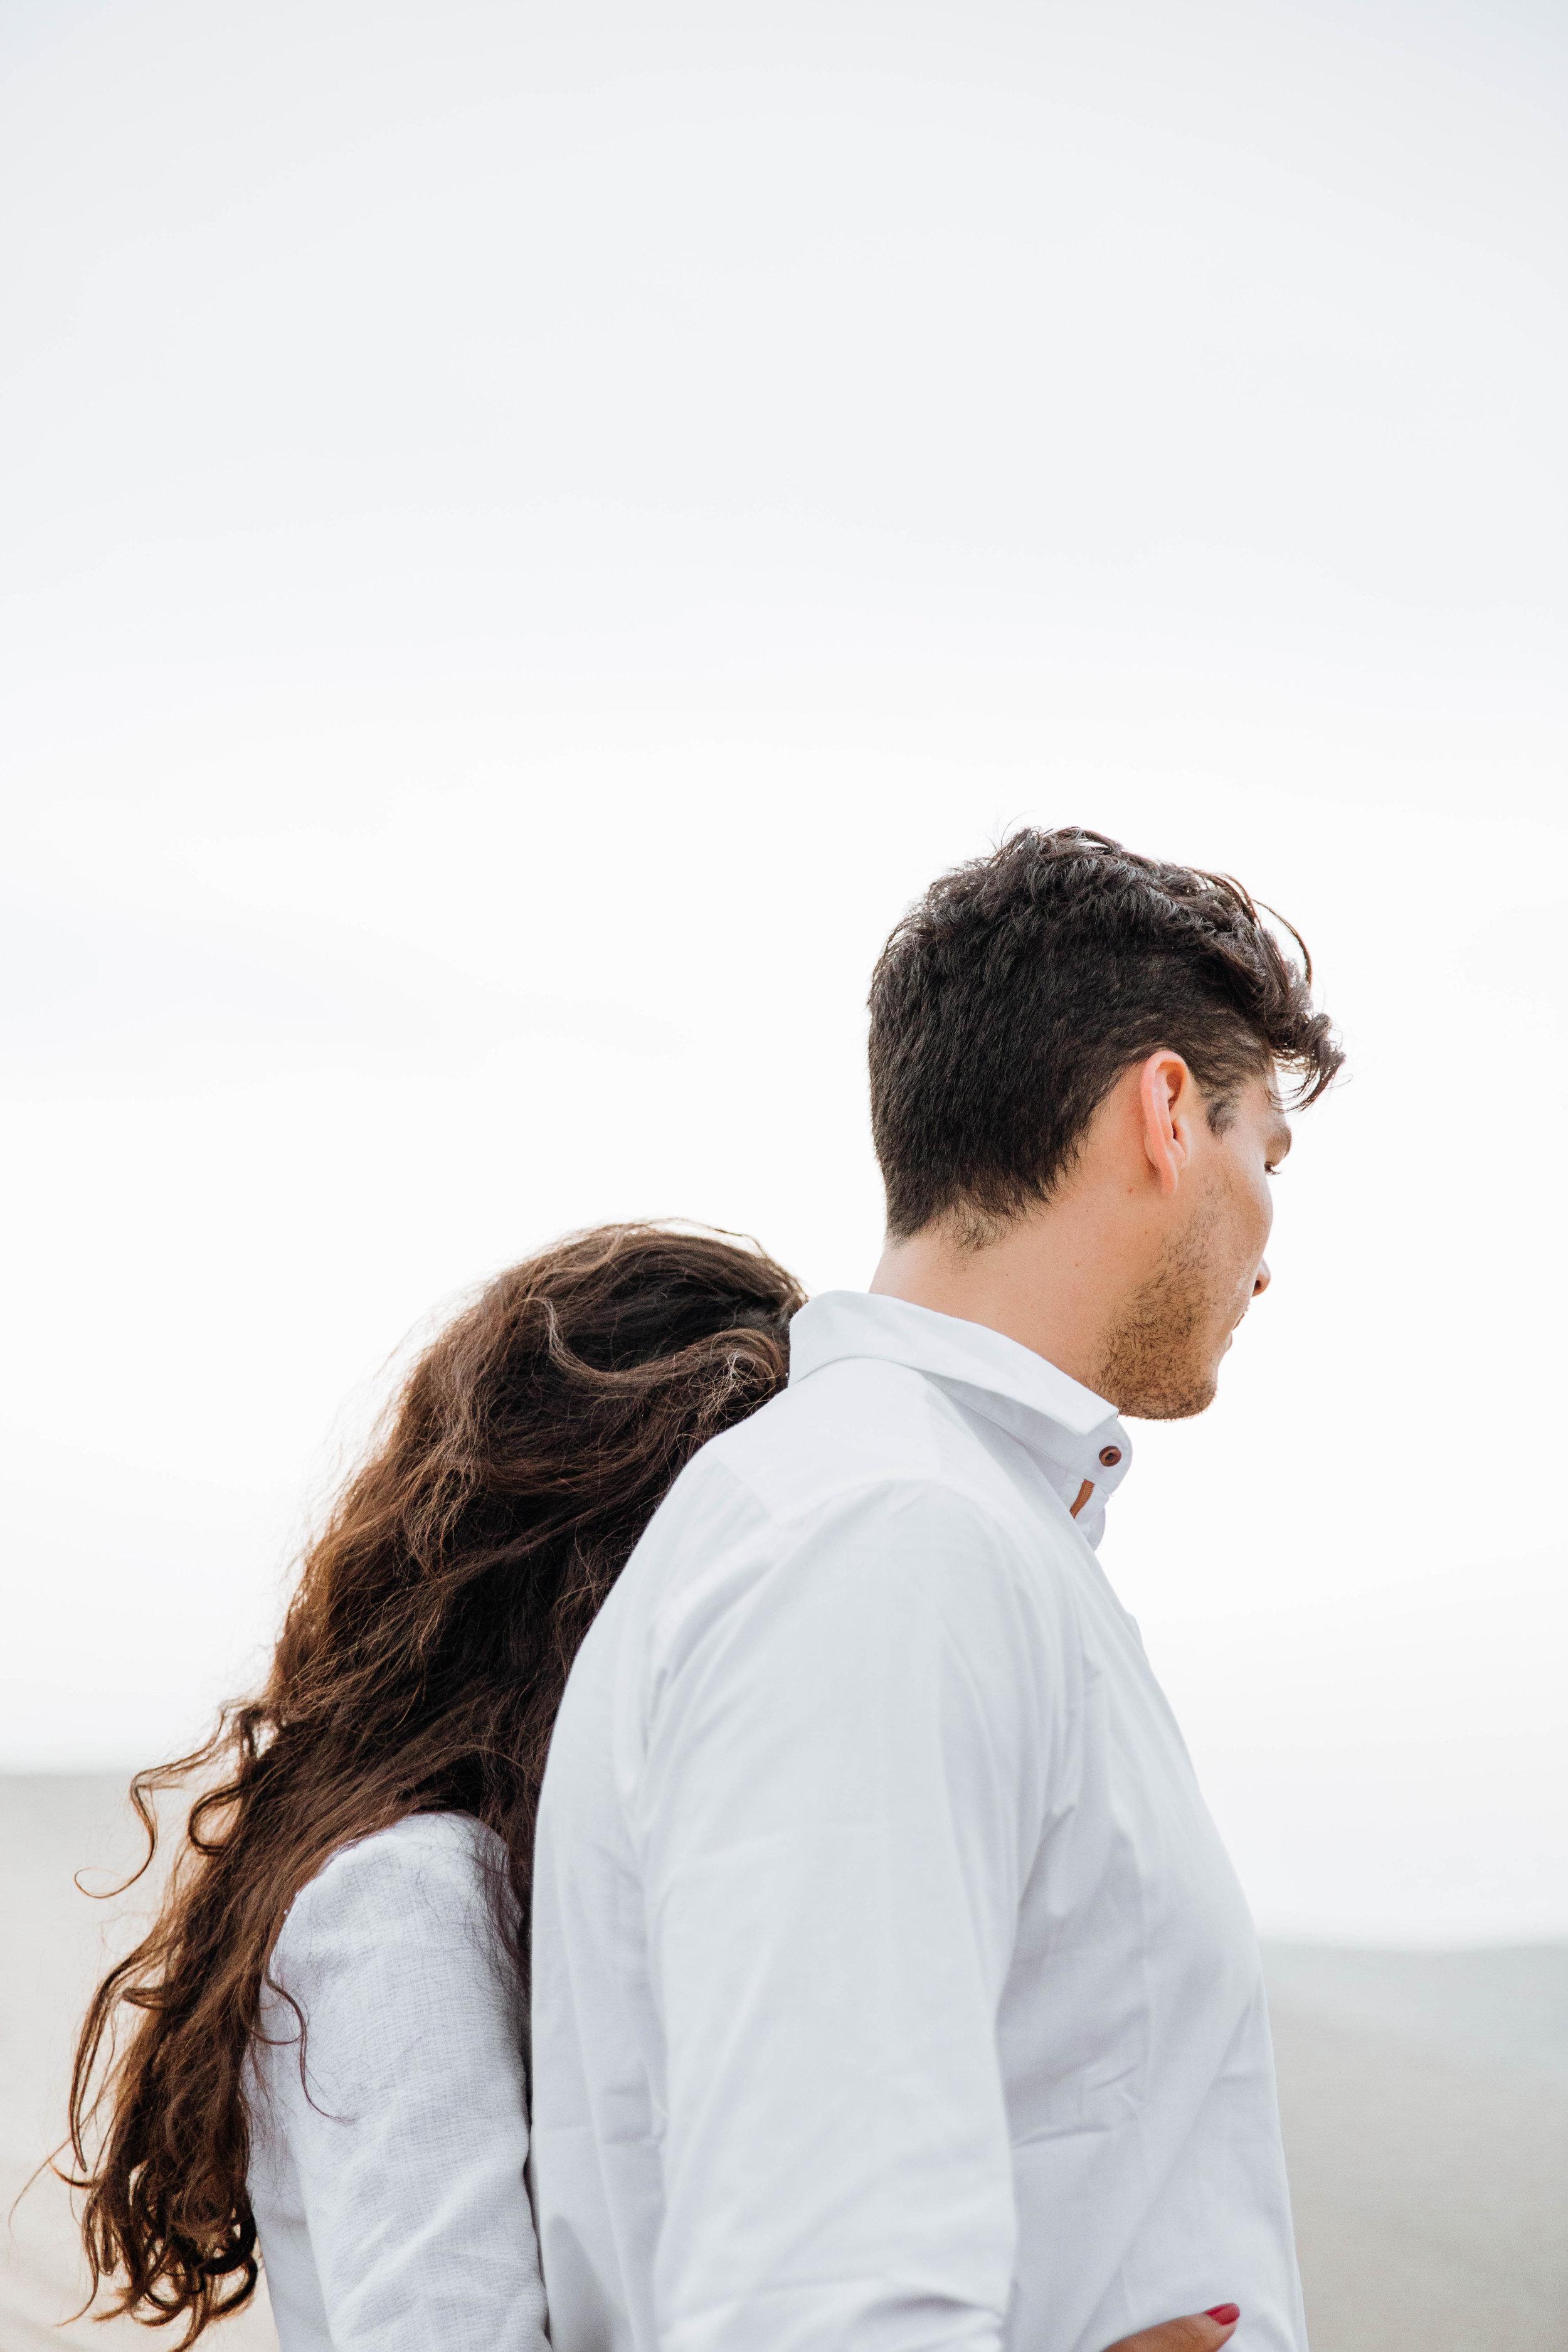 huacachina-peru-honeymoon-elopement-destination-wedding-photography-michael-cozzens-3.jpg